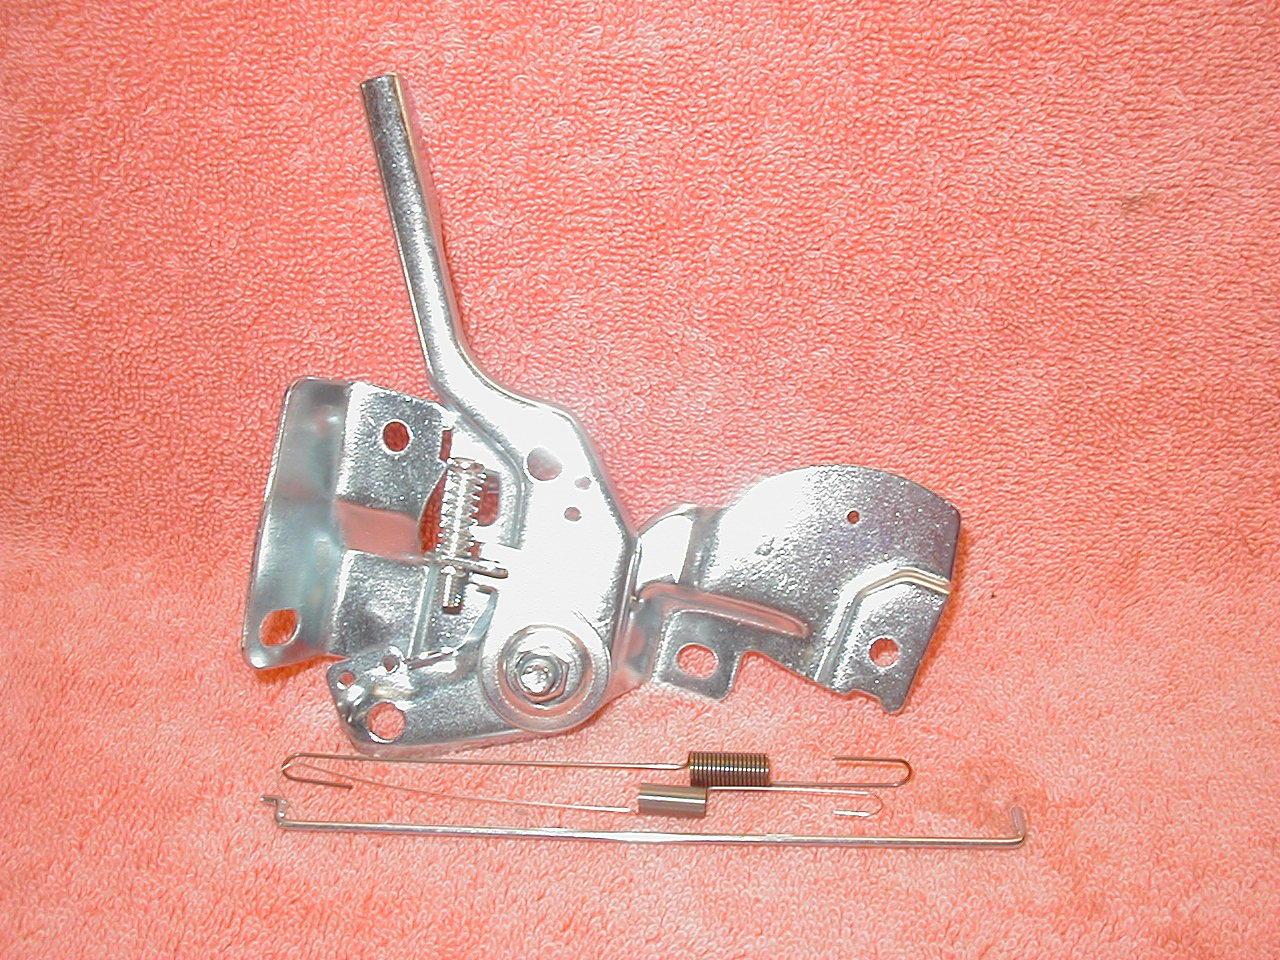 Predator 212 cc harbor 69730 r210 iii engine parts for 69730